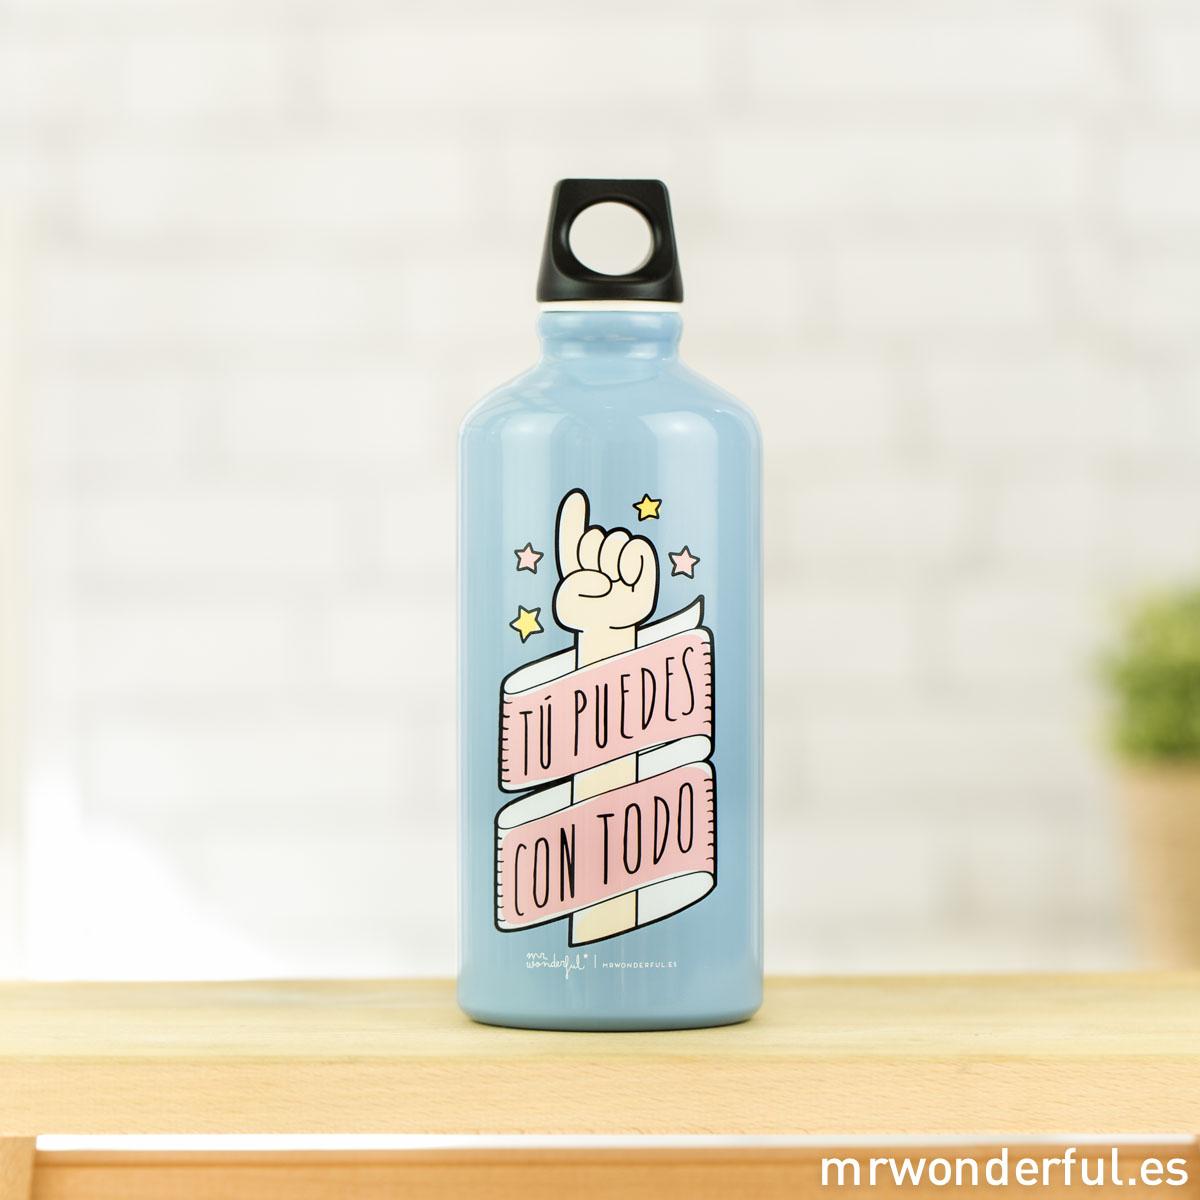 mrwonderful_botella04_botella-aluminio-tu-puedes-con-todo-4